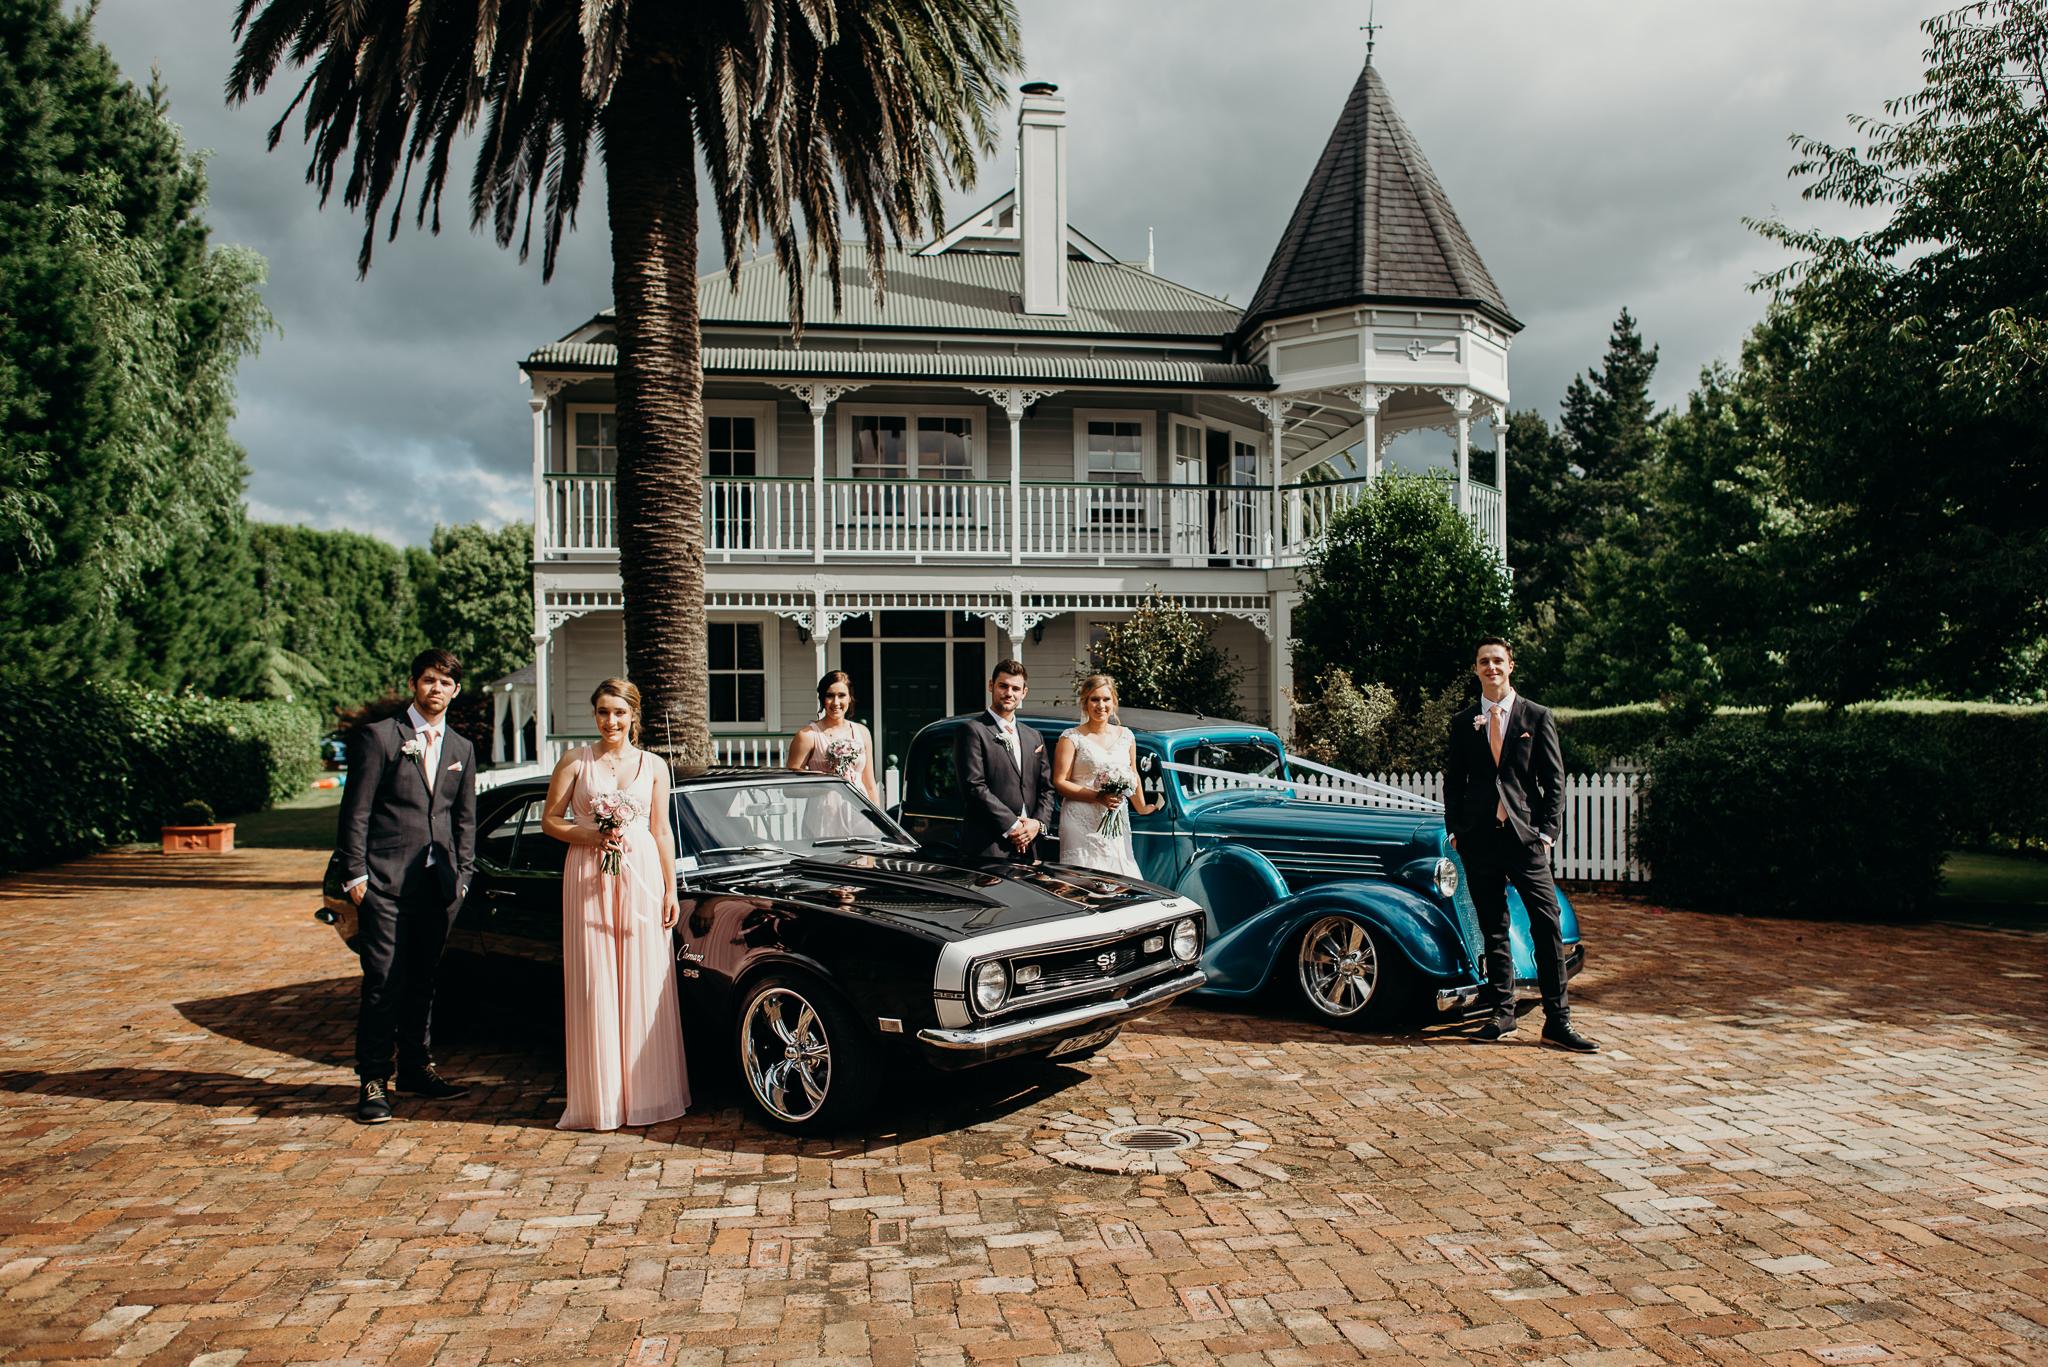 Tauranga-Coromandel-Elegant-Wedding-Photographer-Charlemagne-Lodge-85.jpg